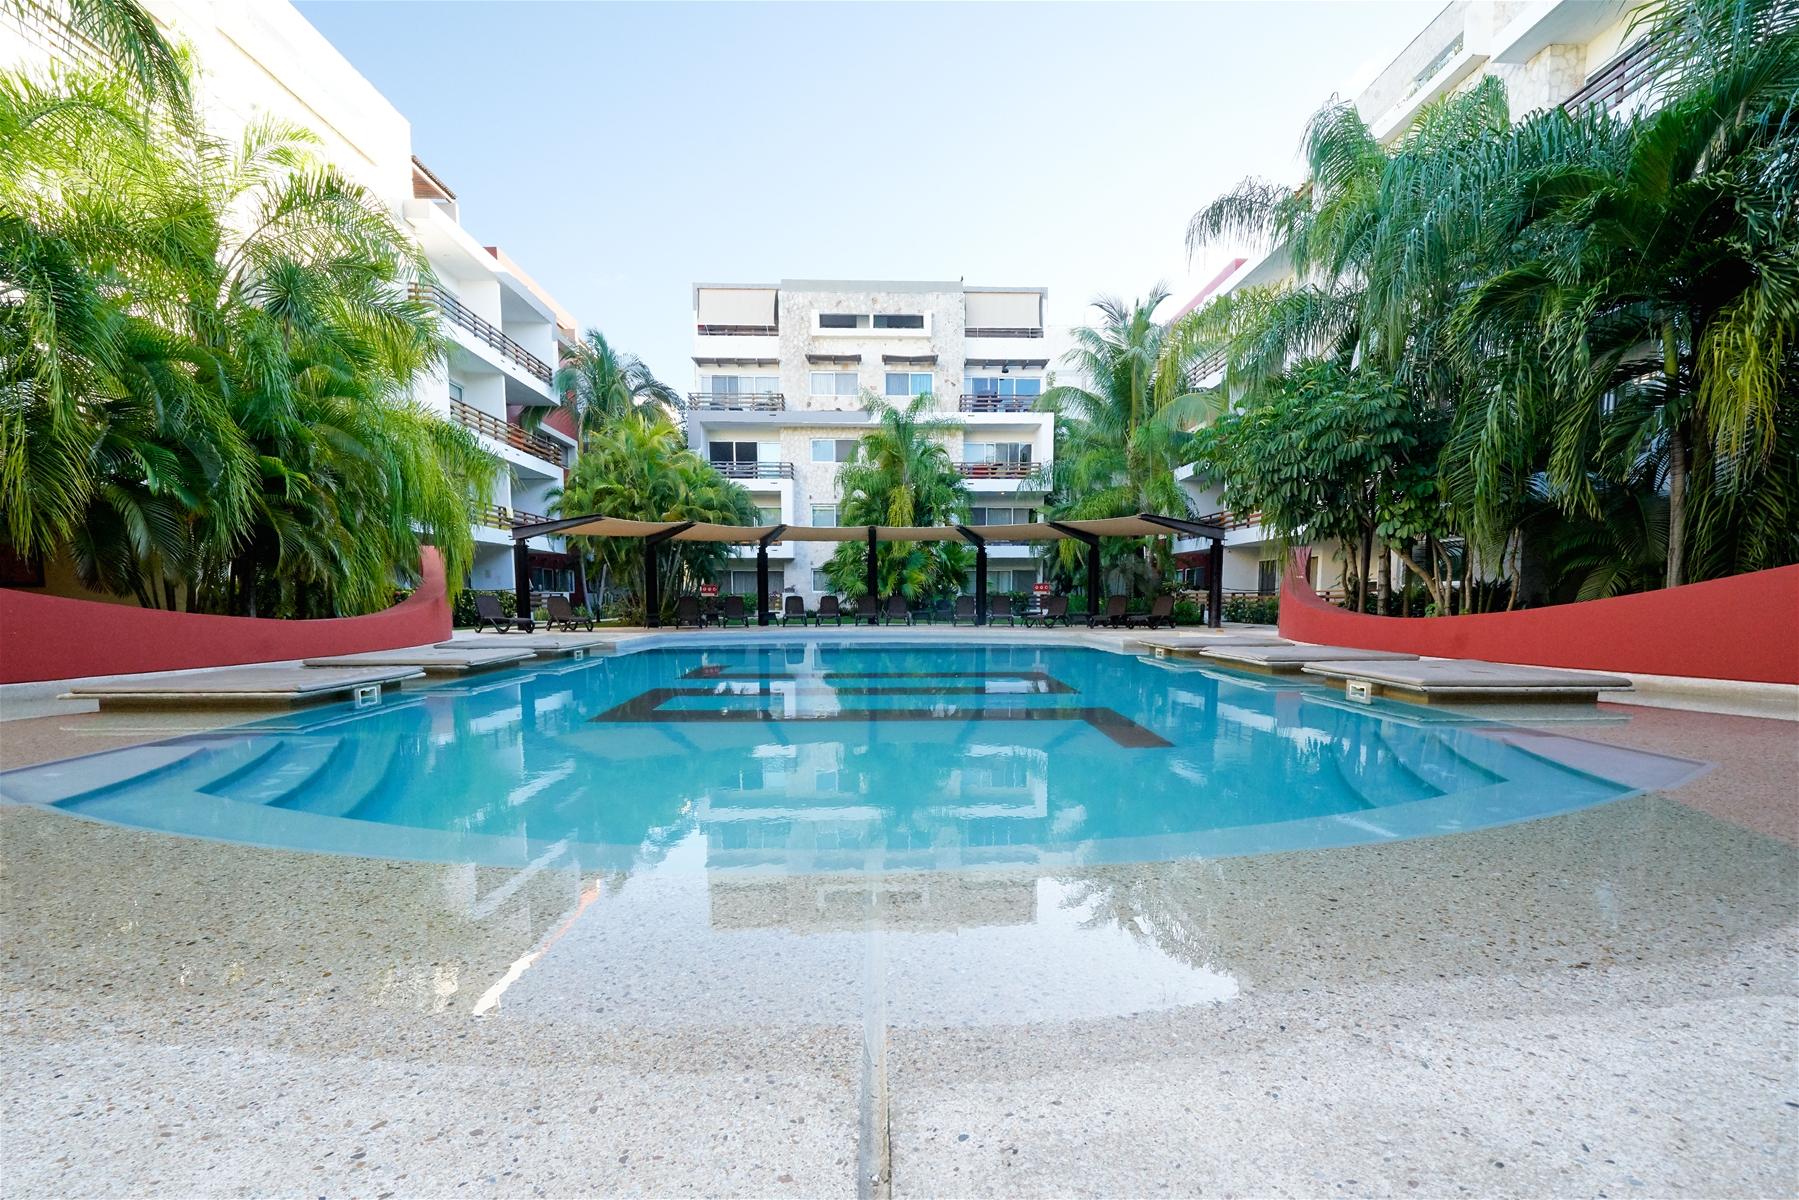 The Sabbia Condos common area pool